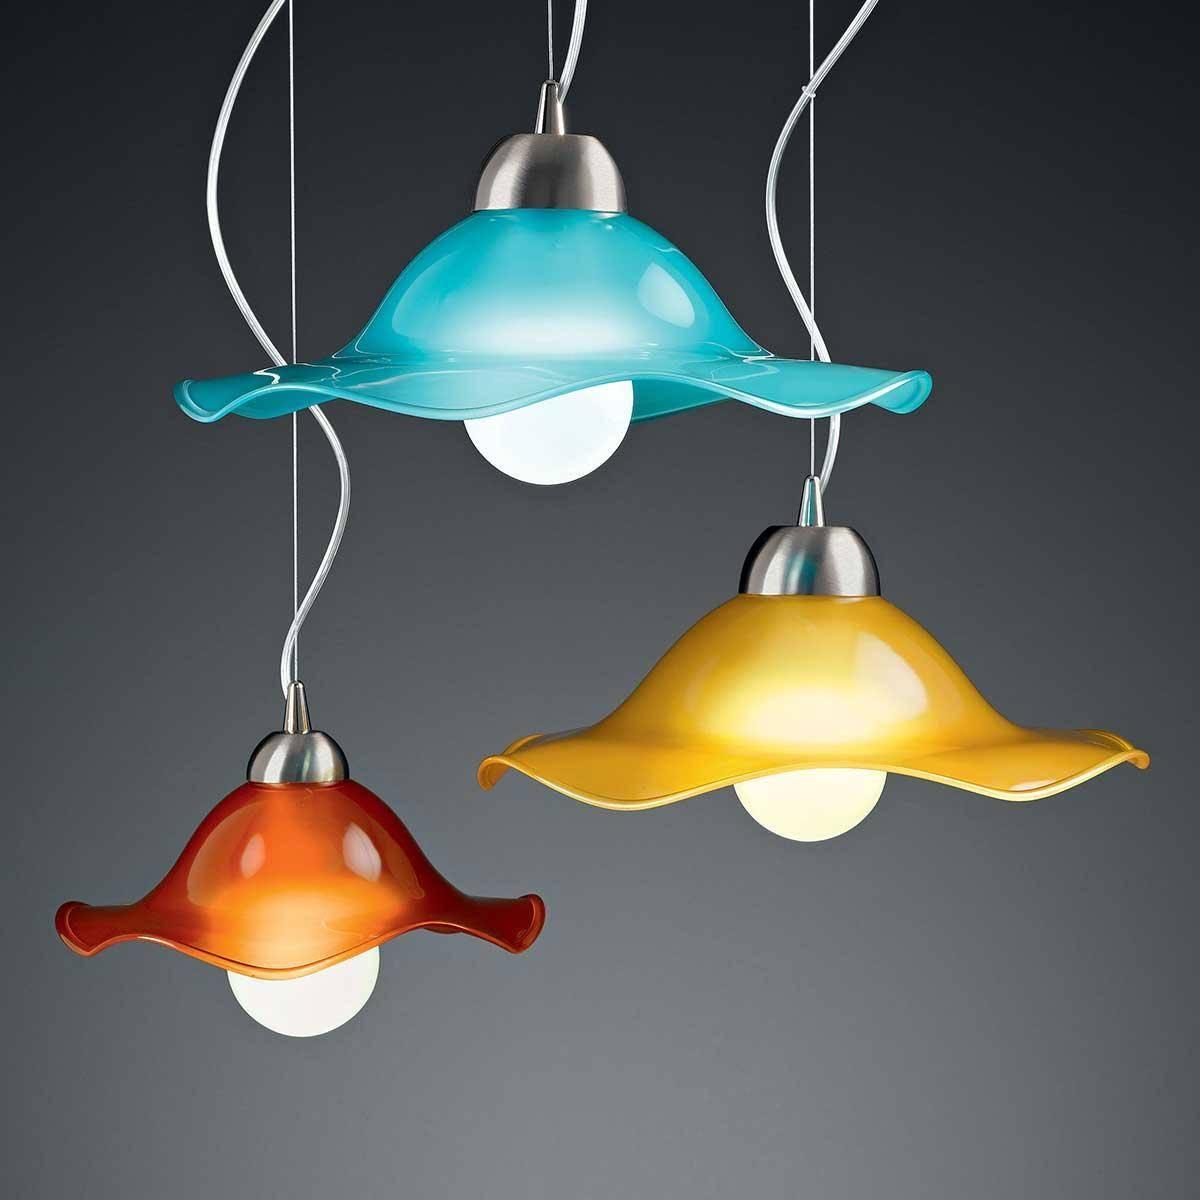 Murano Glass Pendant Lights - Murano Glass Chandeliers intended for Murano Pendant Lights (Image 10 of 15)